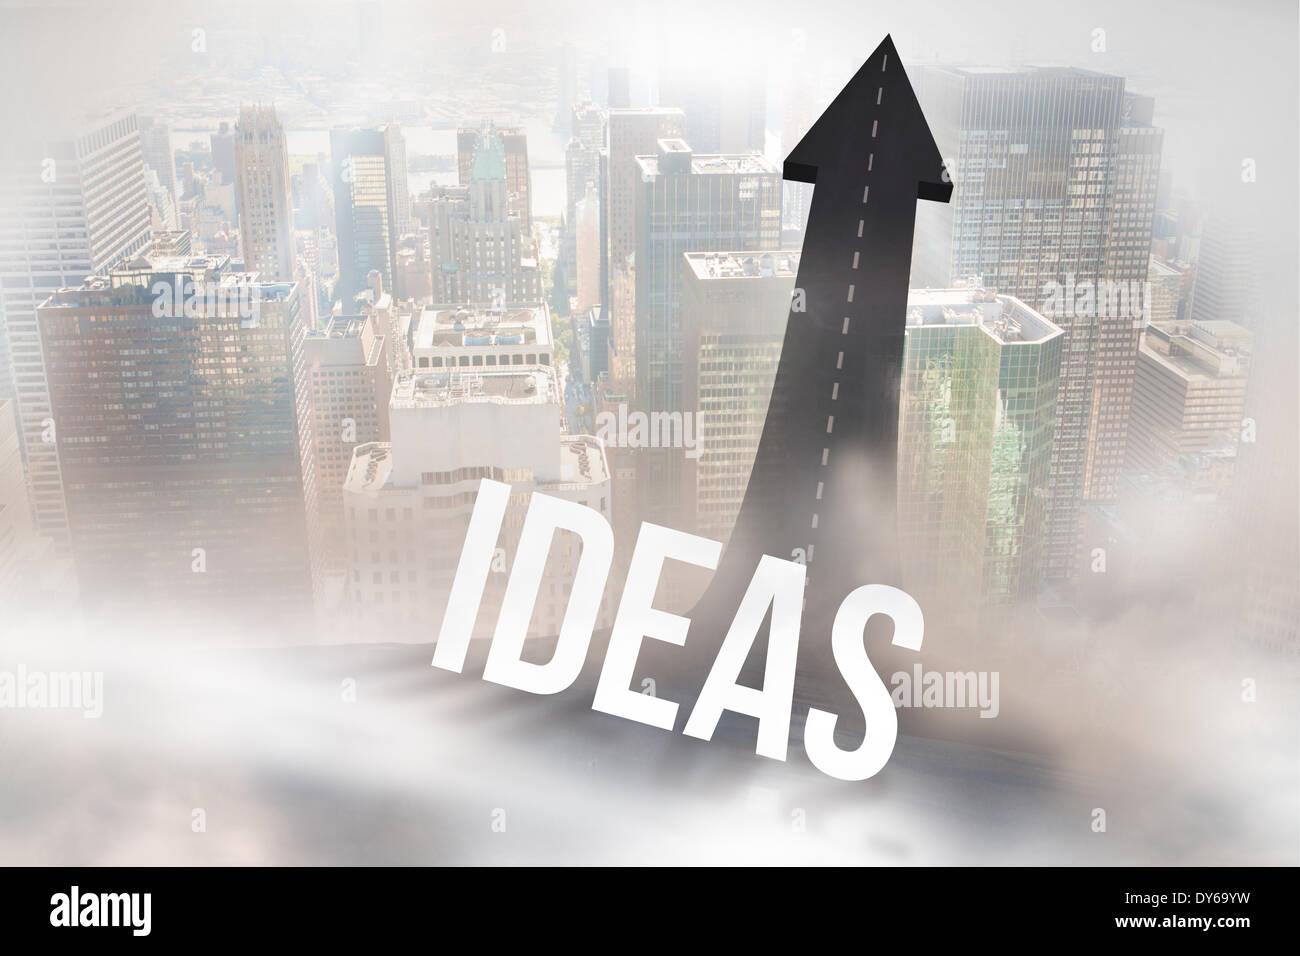 Ideas contra la carretera girando en la flecha Imagen De Stock